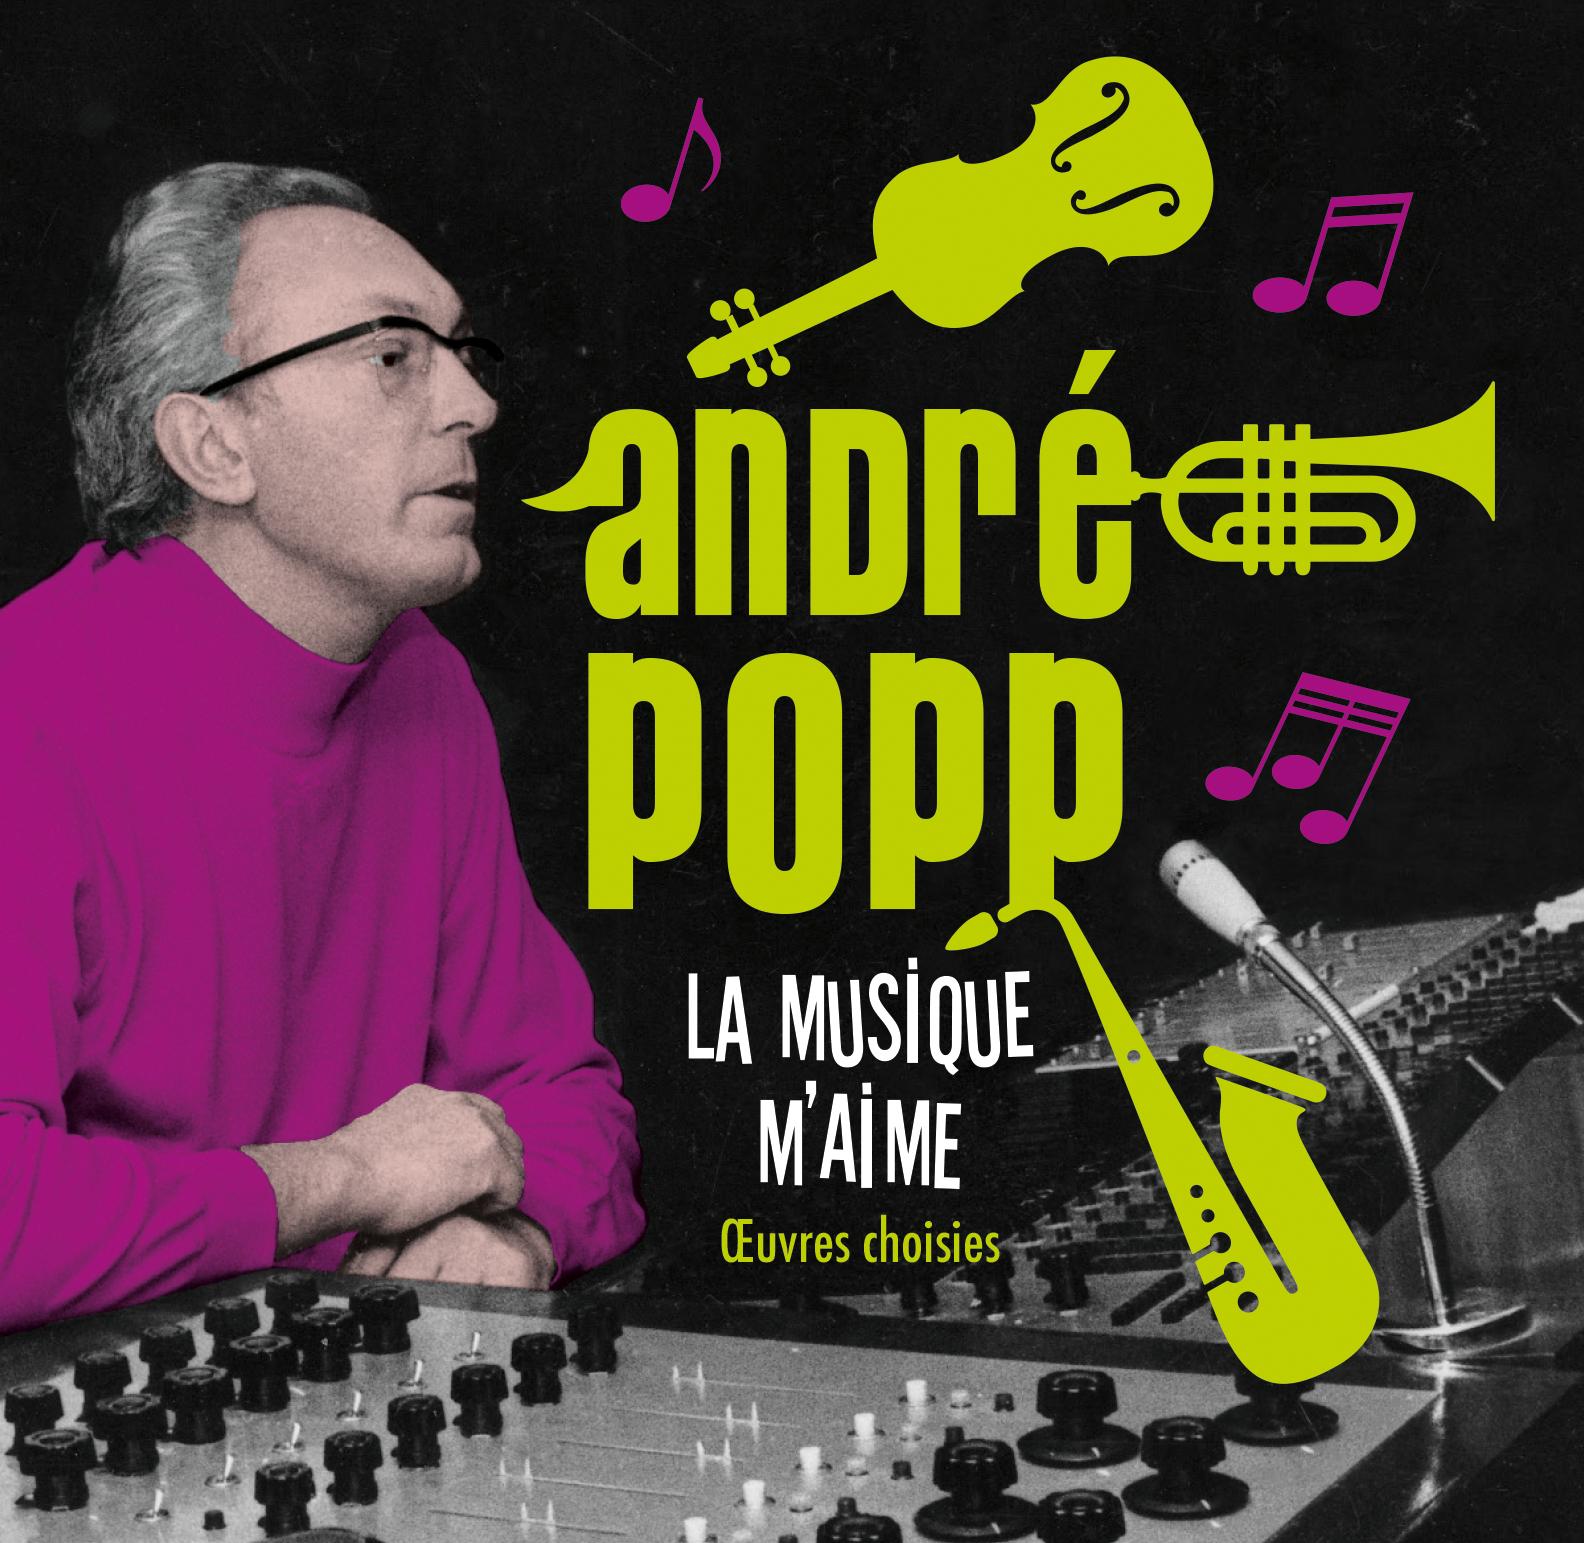 Coffret-Andre Popp.indd